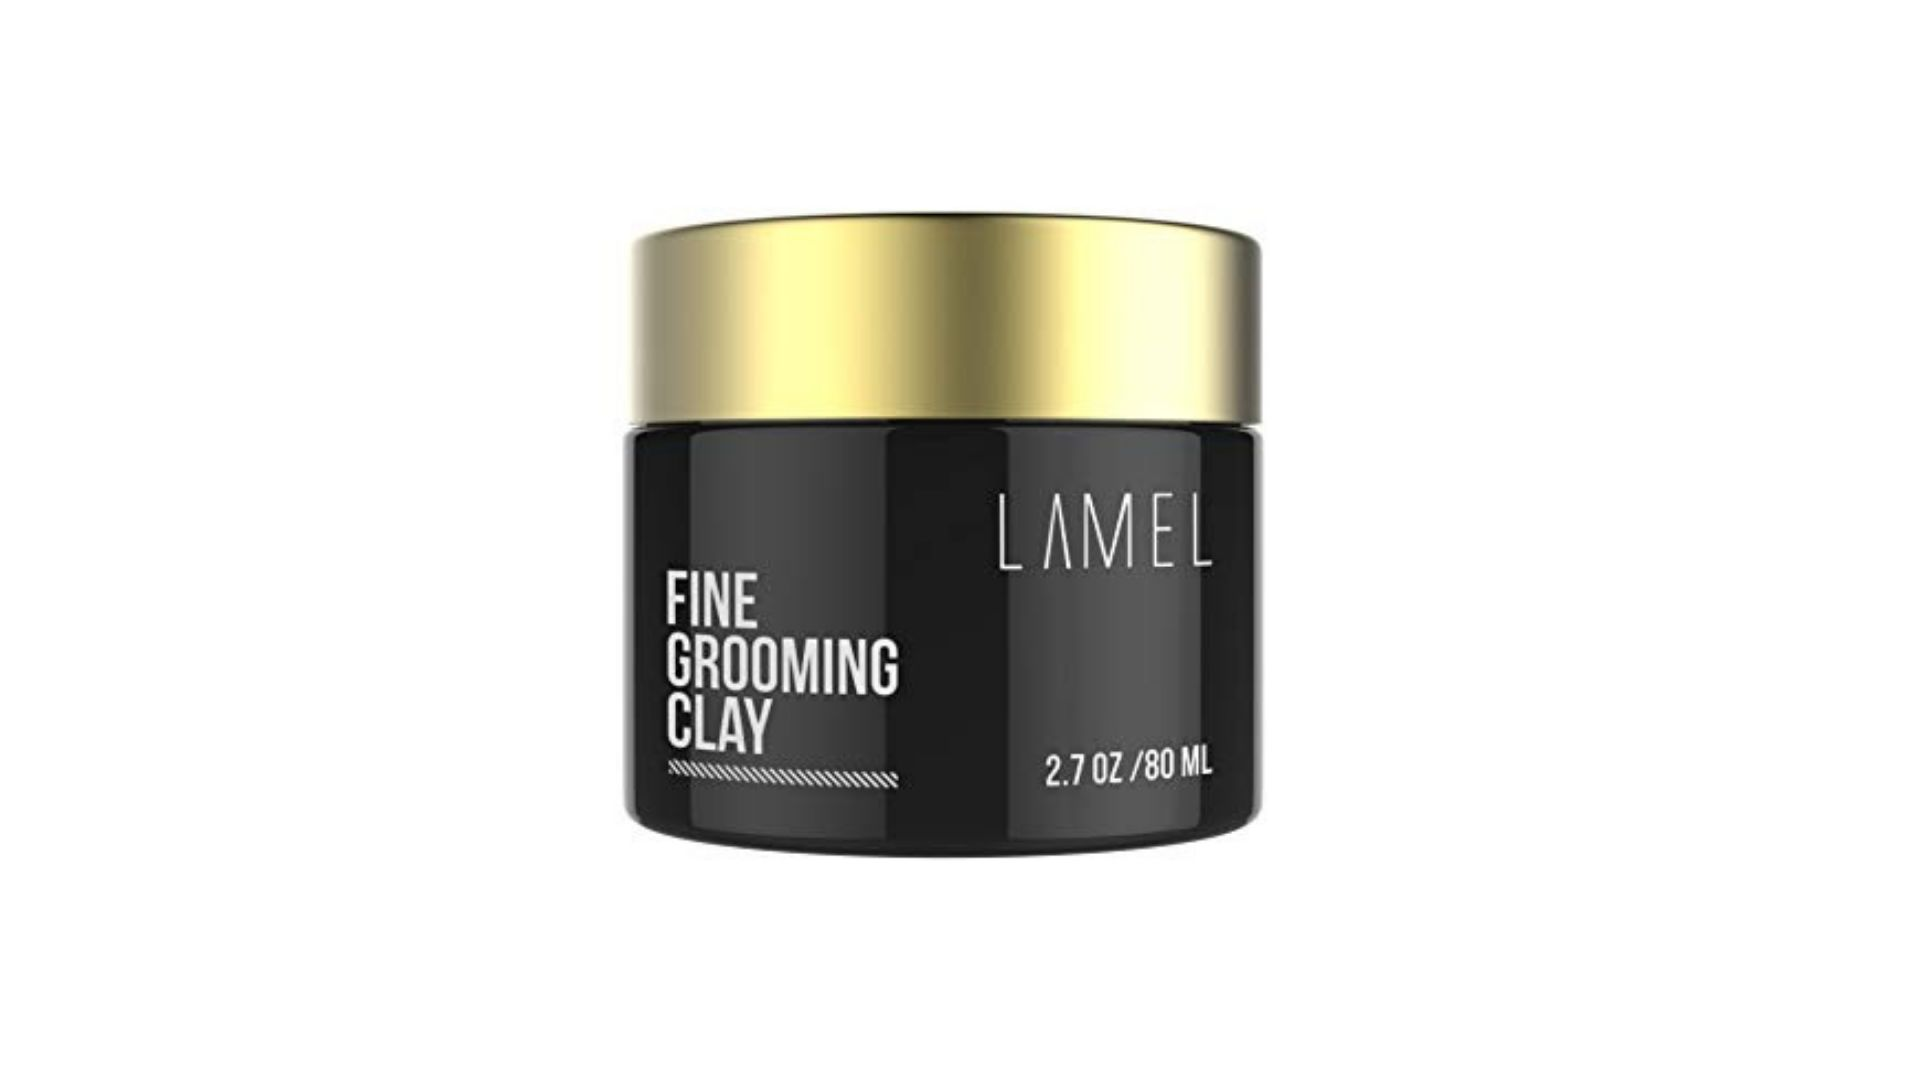 Best Hair Clay For Men - Lamel Fine Grooming Clay